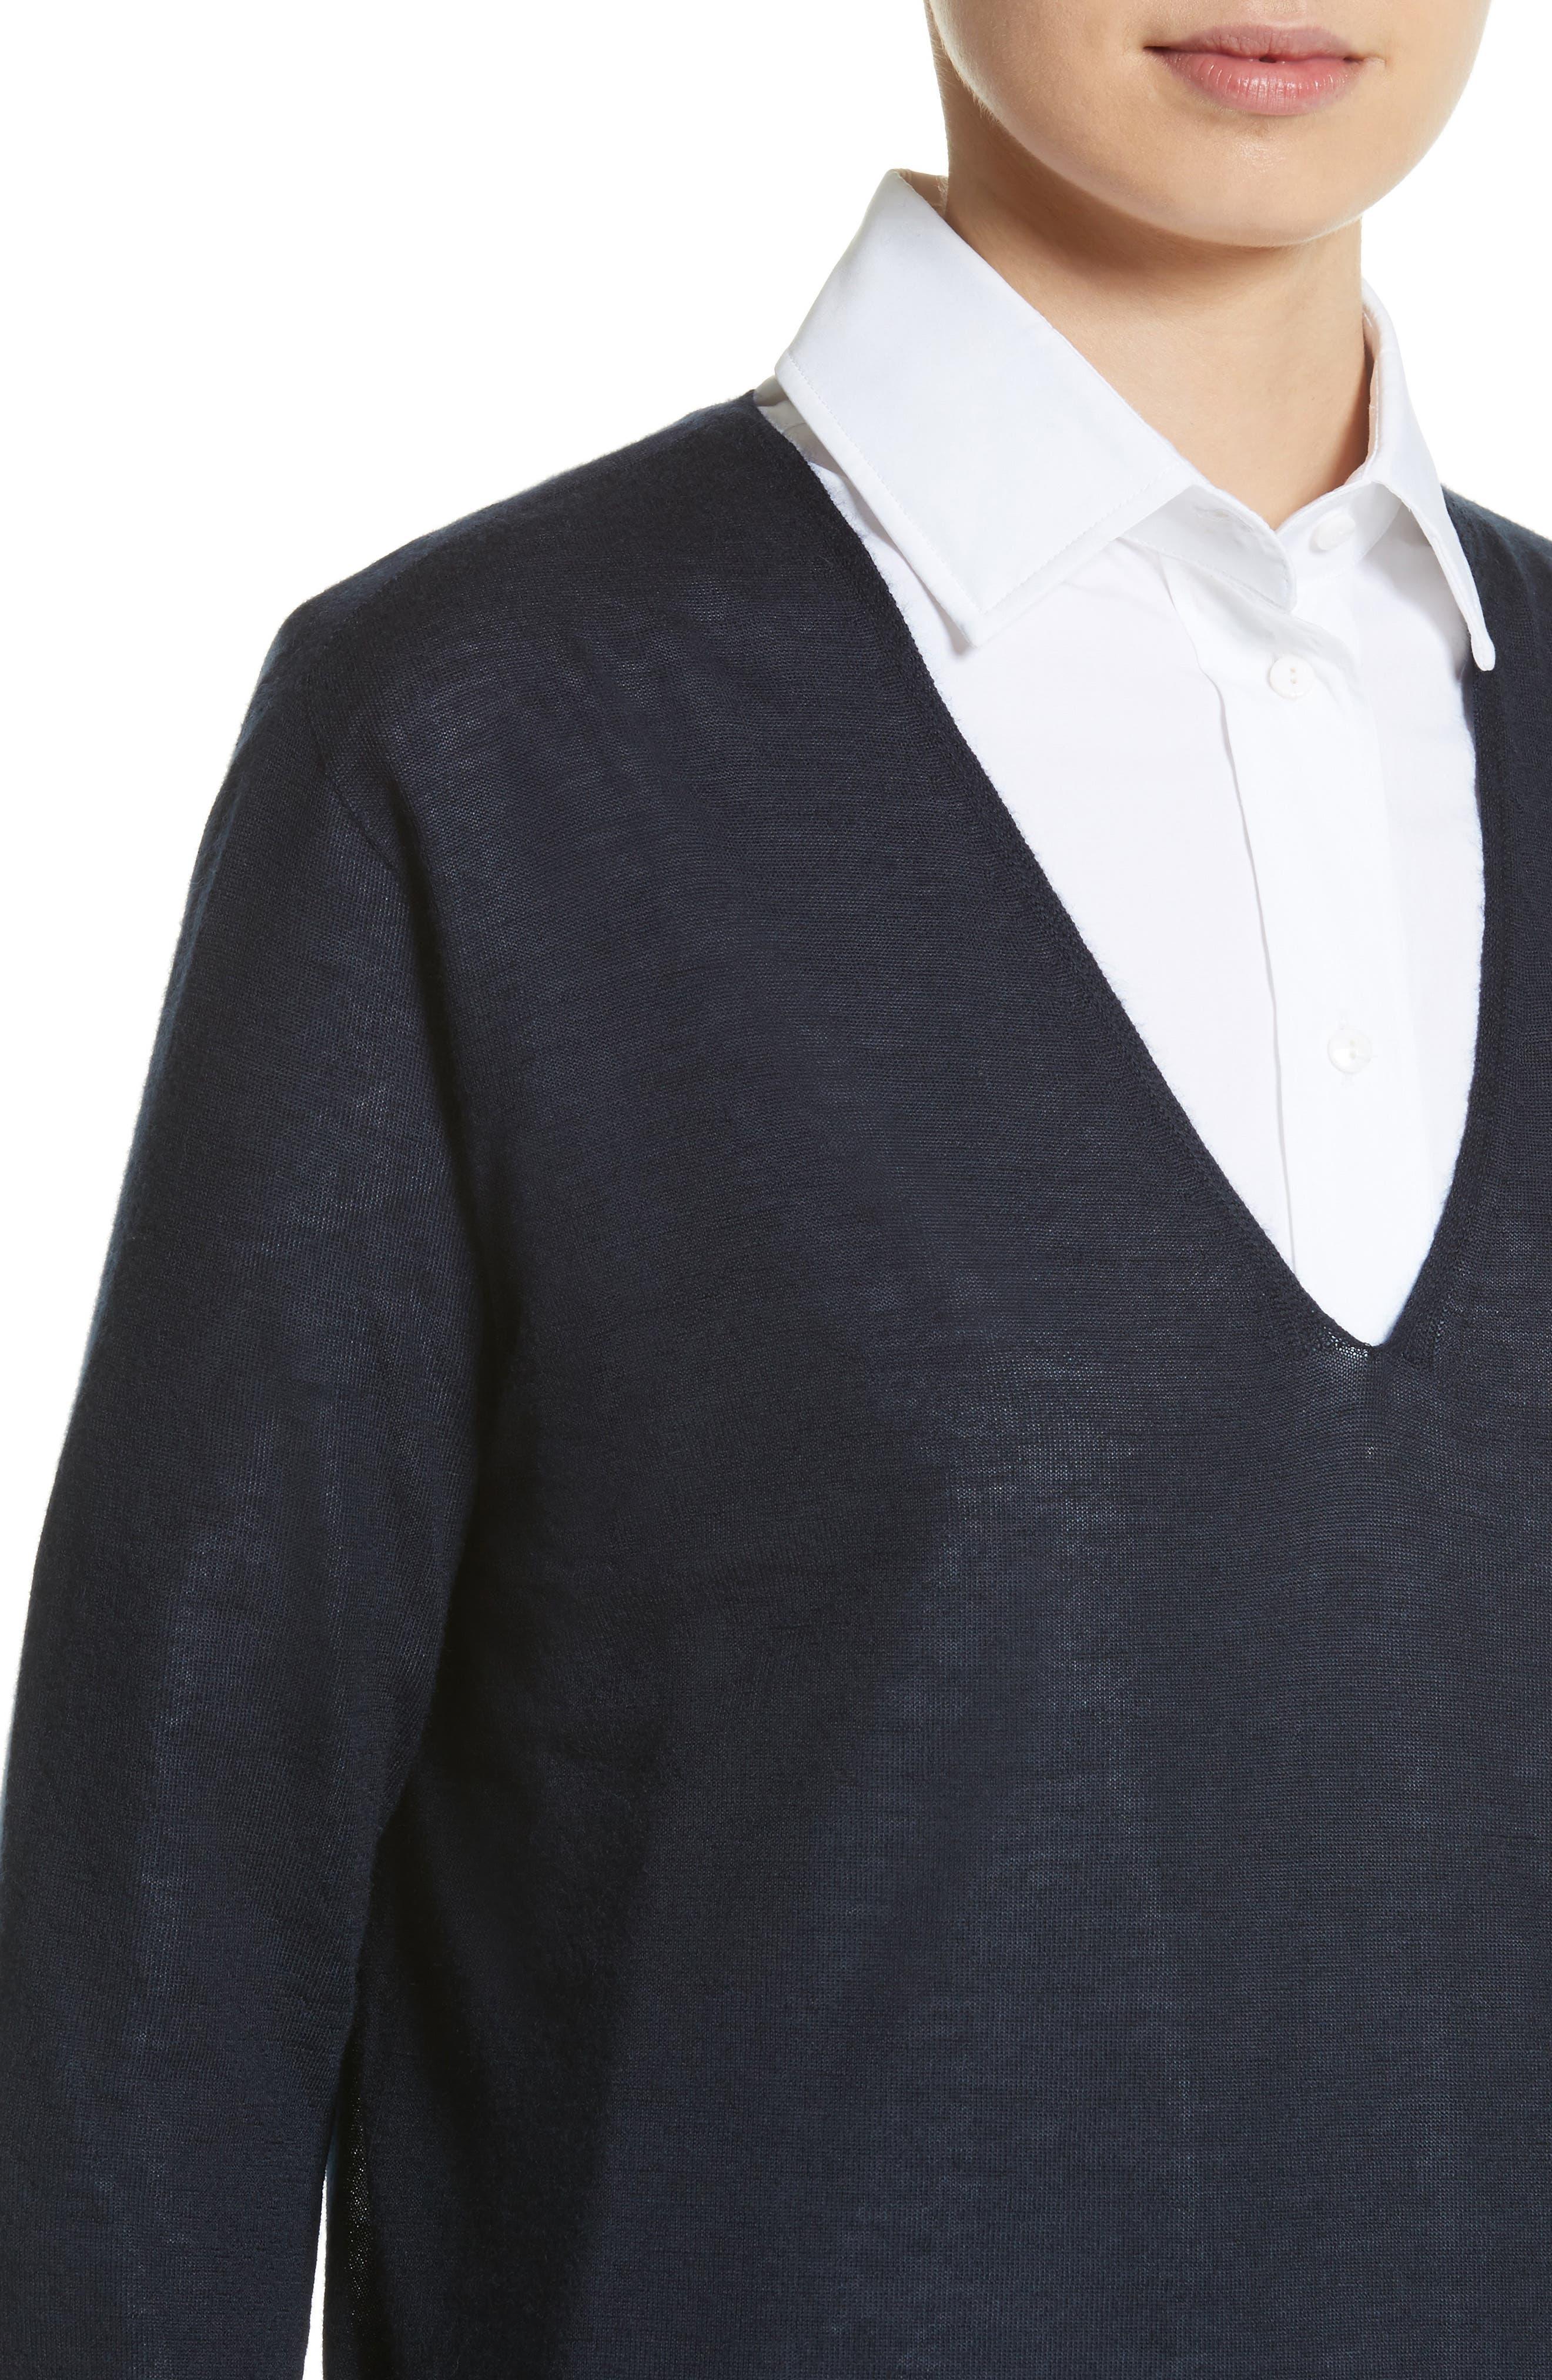 Vela Cashmere Sweater,                             Alternate thumbnail 4, color,                             411